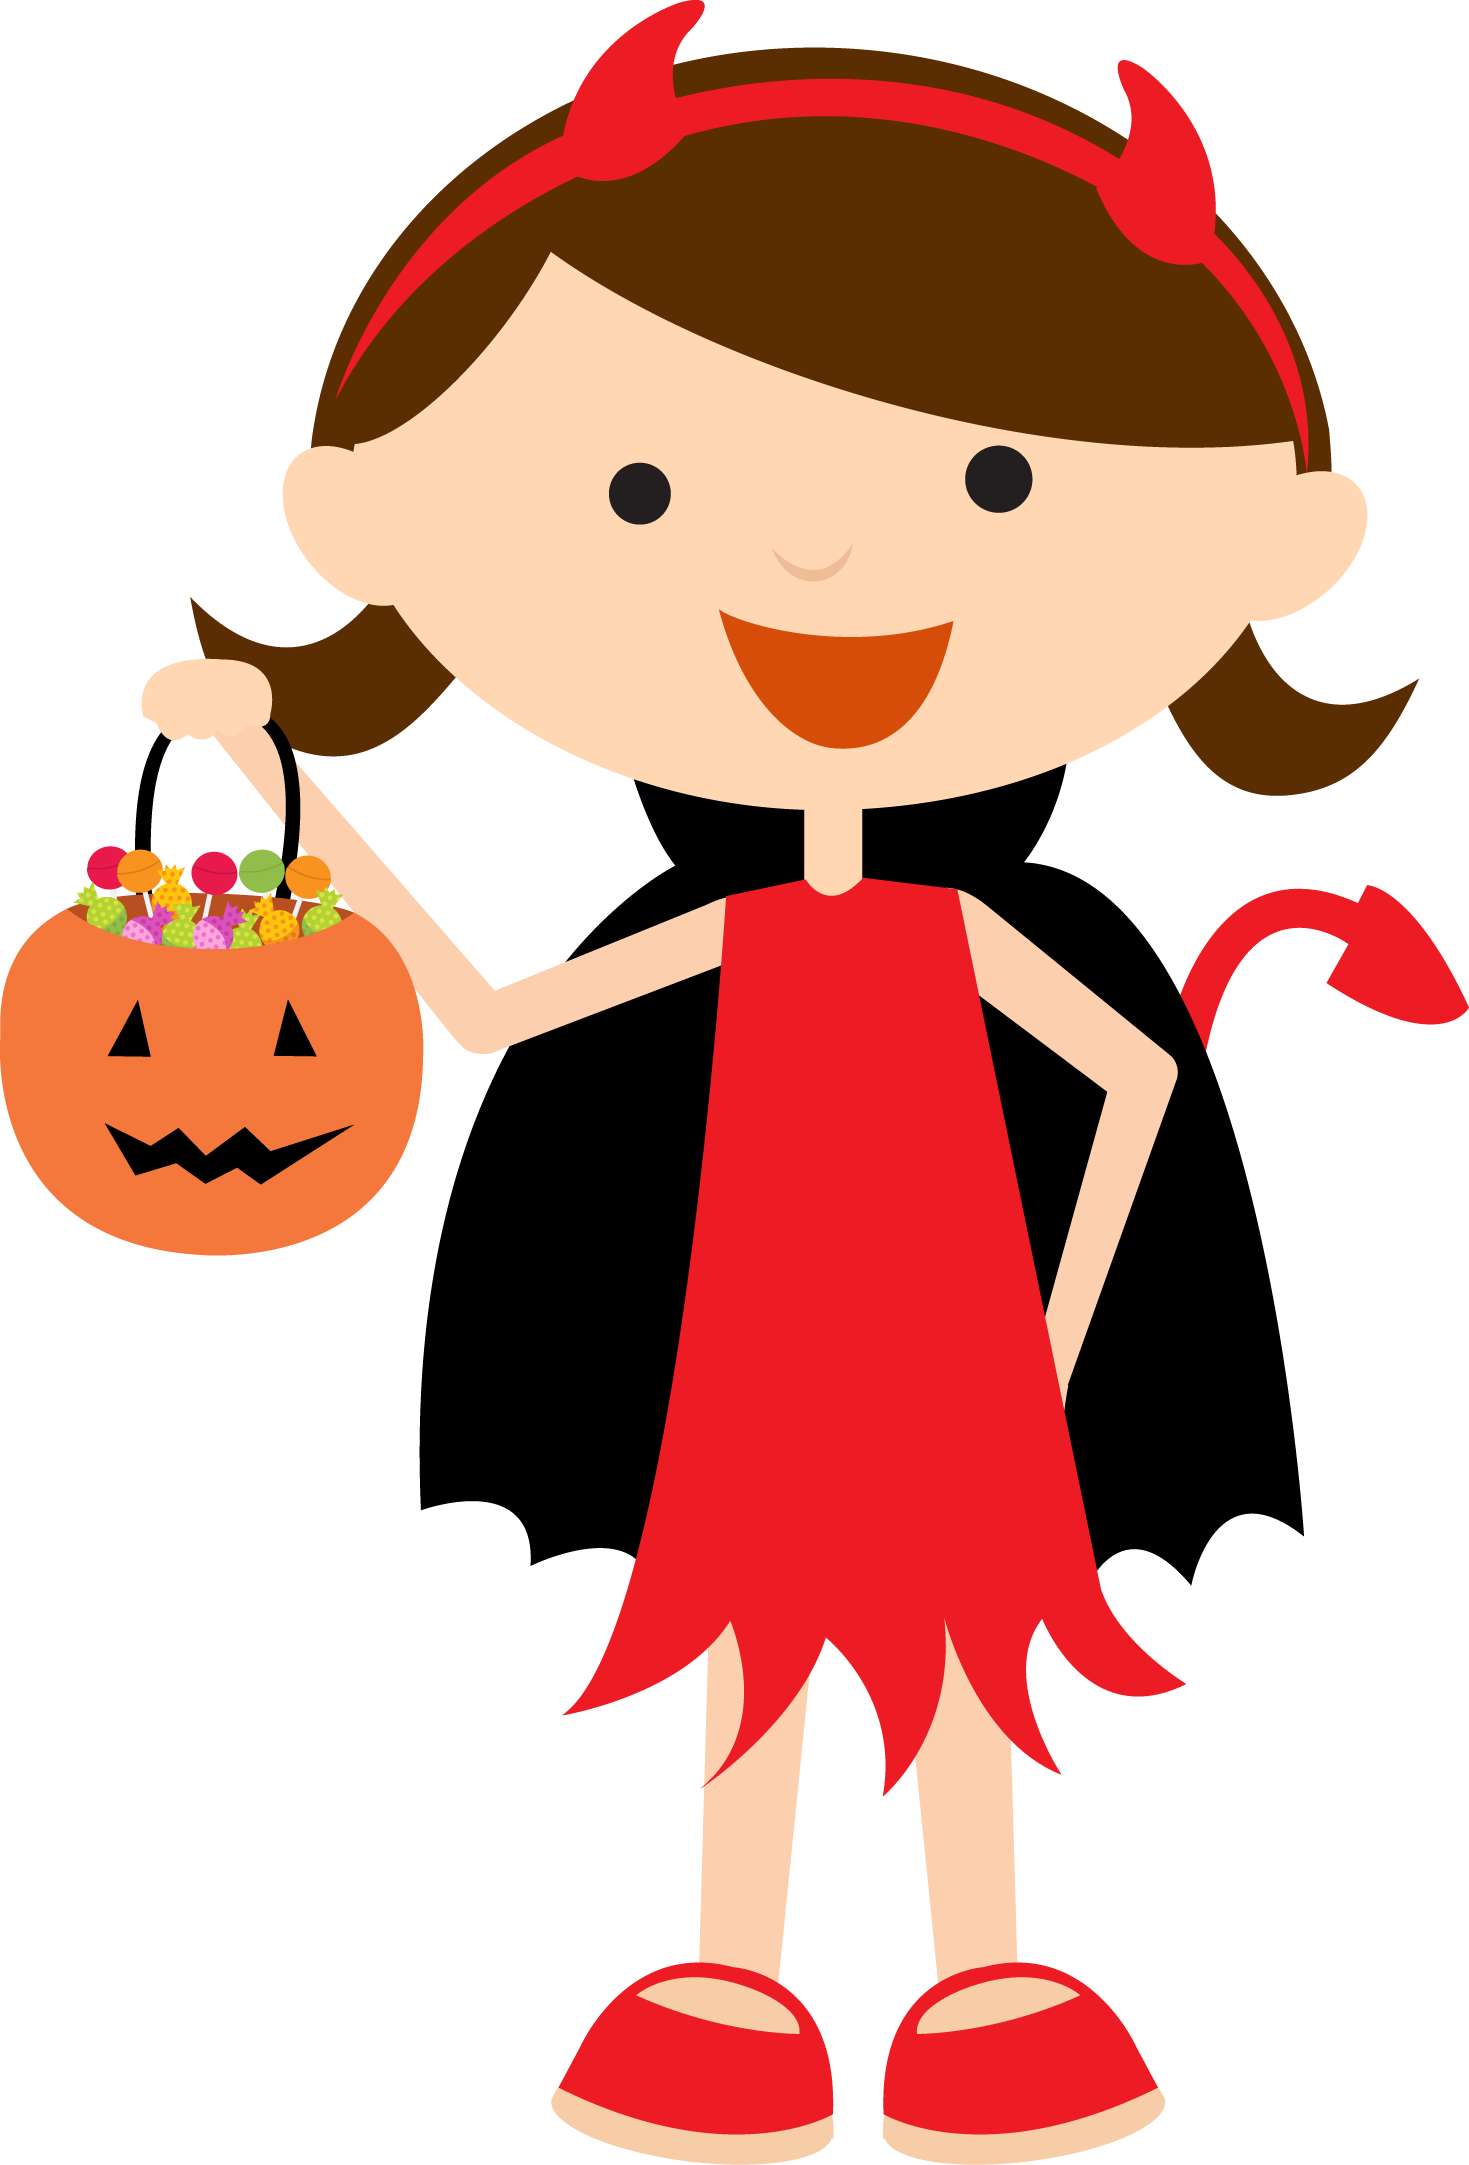 Crafts clipart halloween. Bdhalloweentrickortreat png minus felt